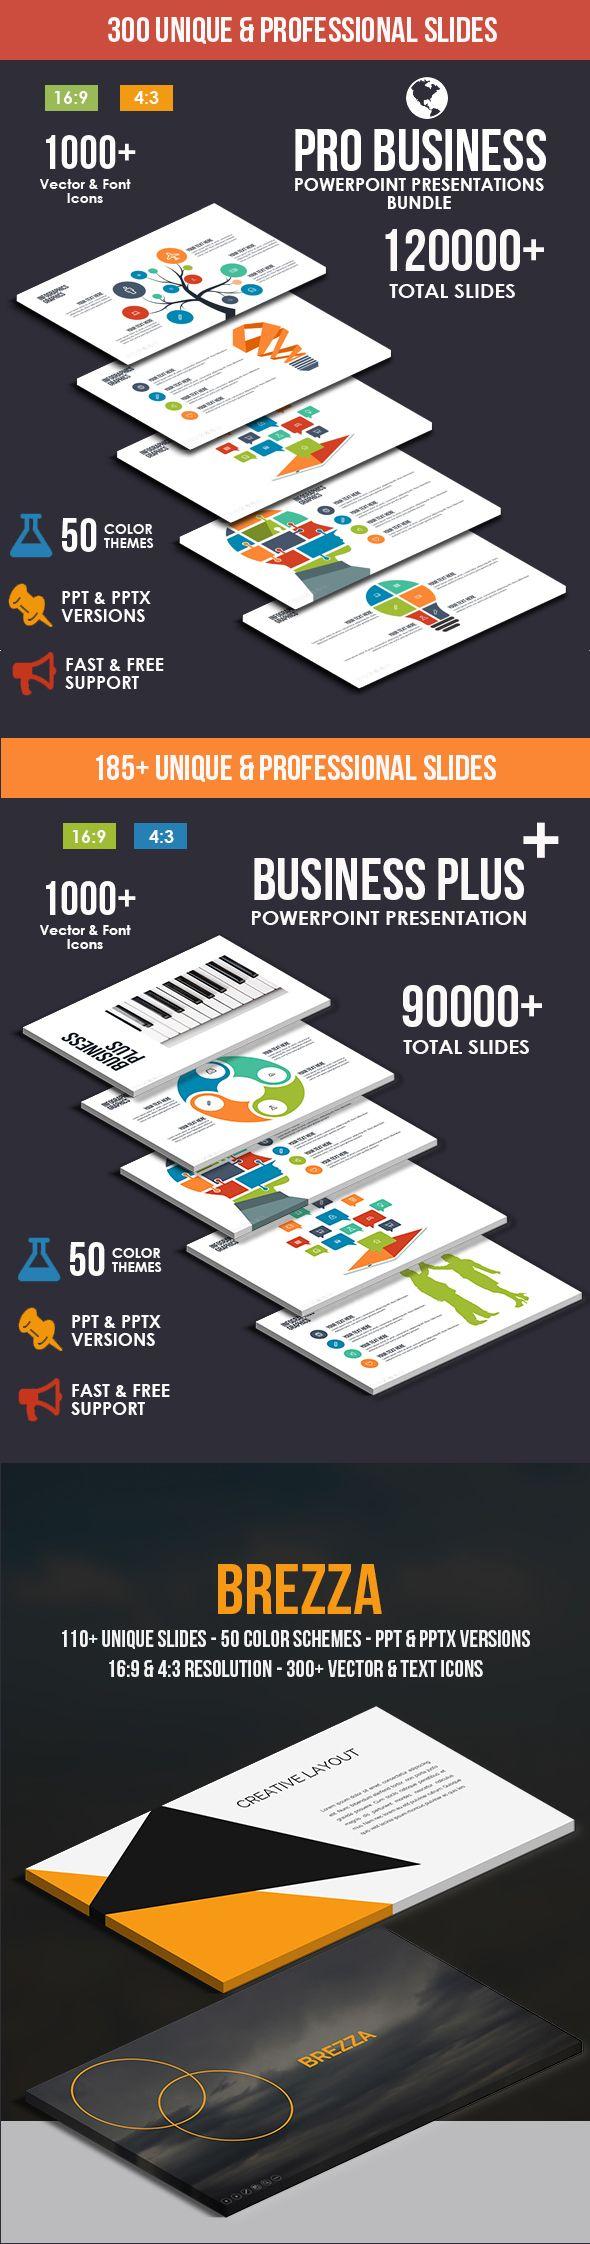 Pro business powerpoint presentations bundle business powerpoint pro business powerpoint presentations bundle business powerpoint templates alramifo Choice Image